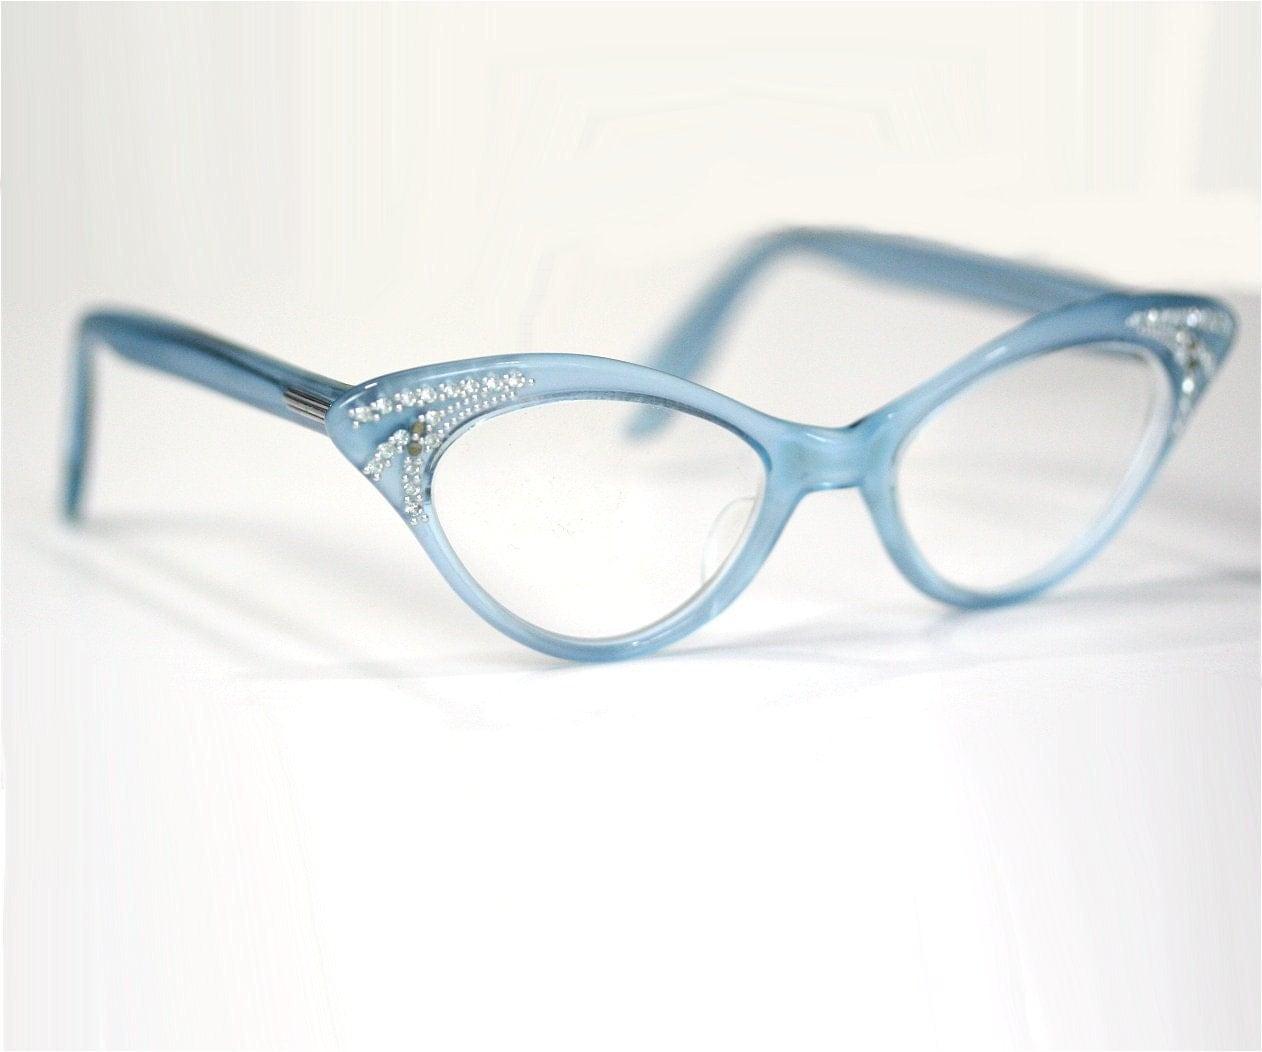 Vintage 50s / 60s Blue Cat Eye Glasses Frames With Rhinestones